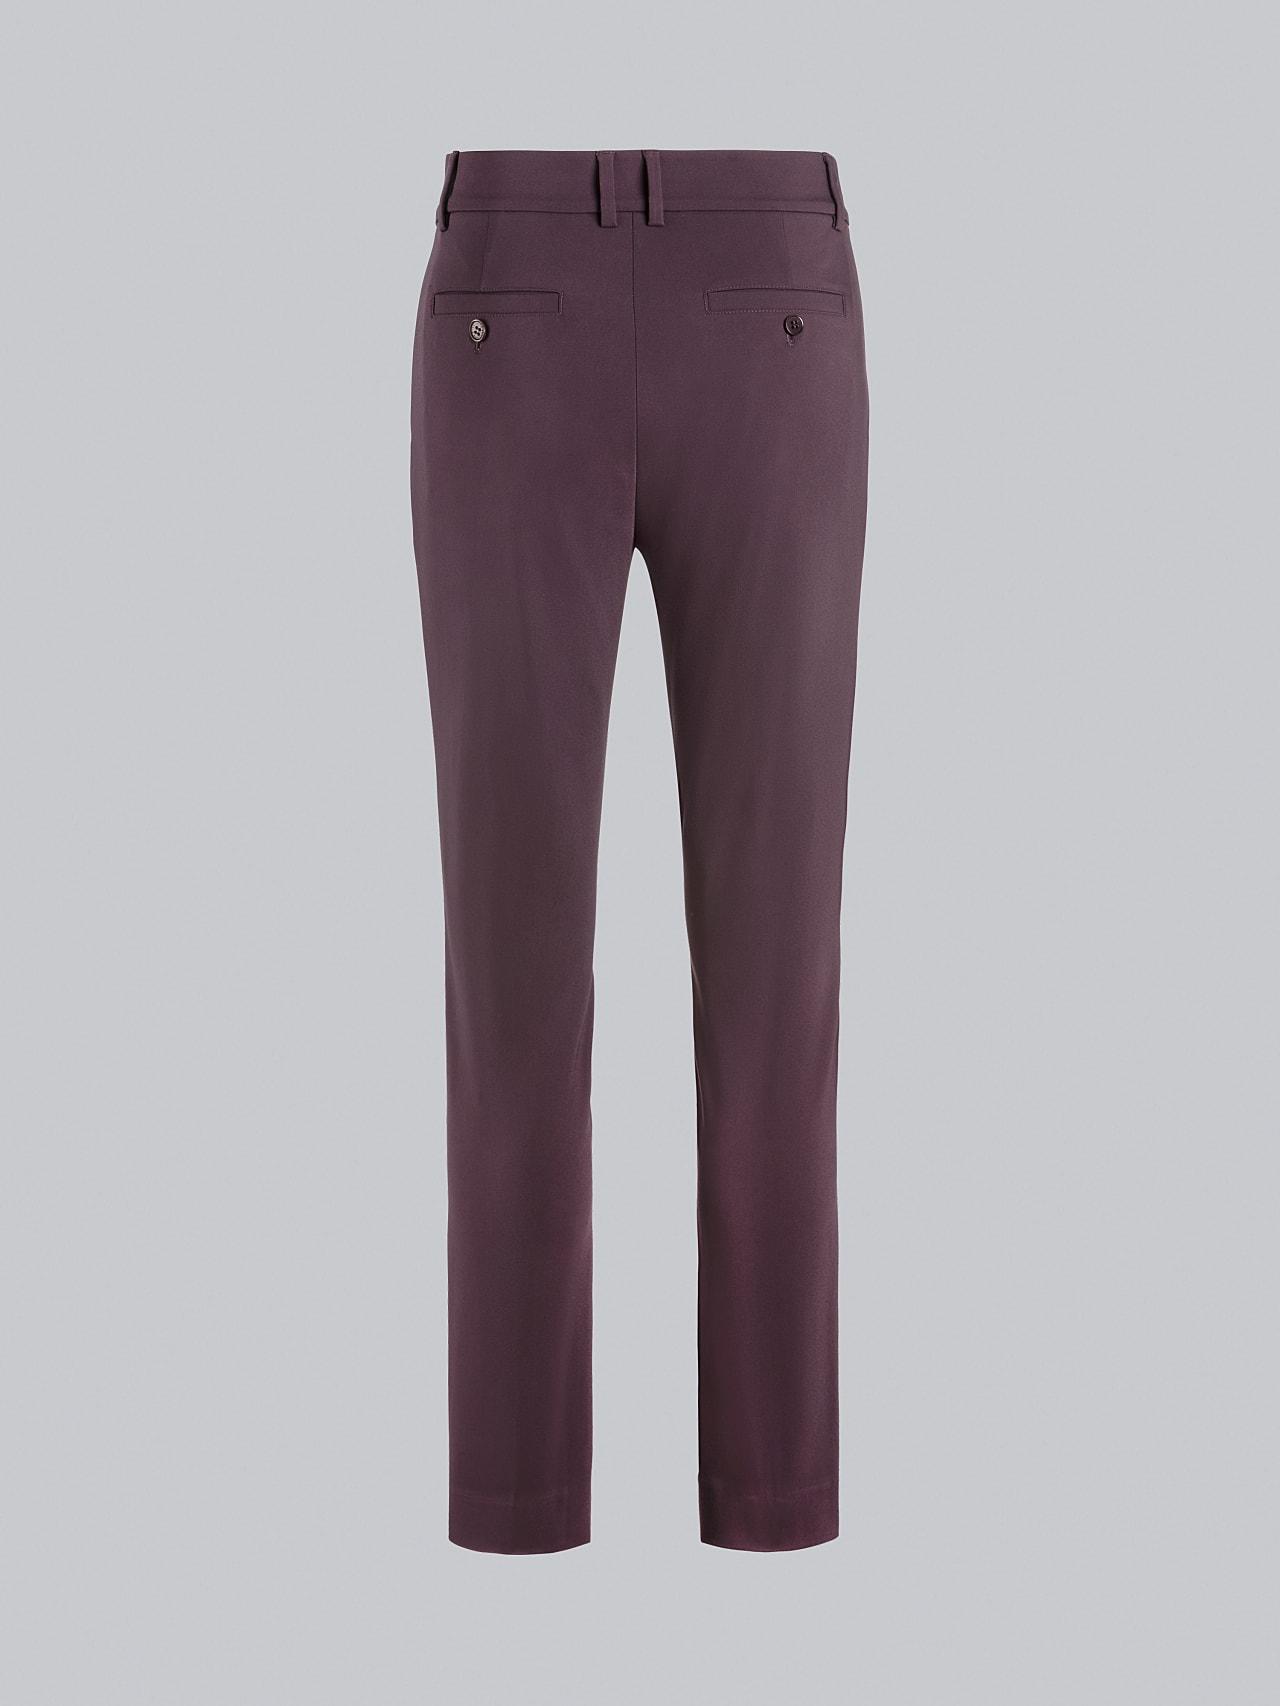 PERTI V1.Y5.02 Slim-Fit Tapered Pants Burgundy Left Alpha Tauri